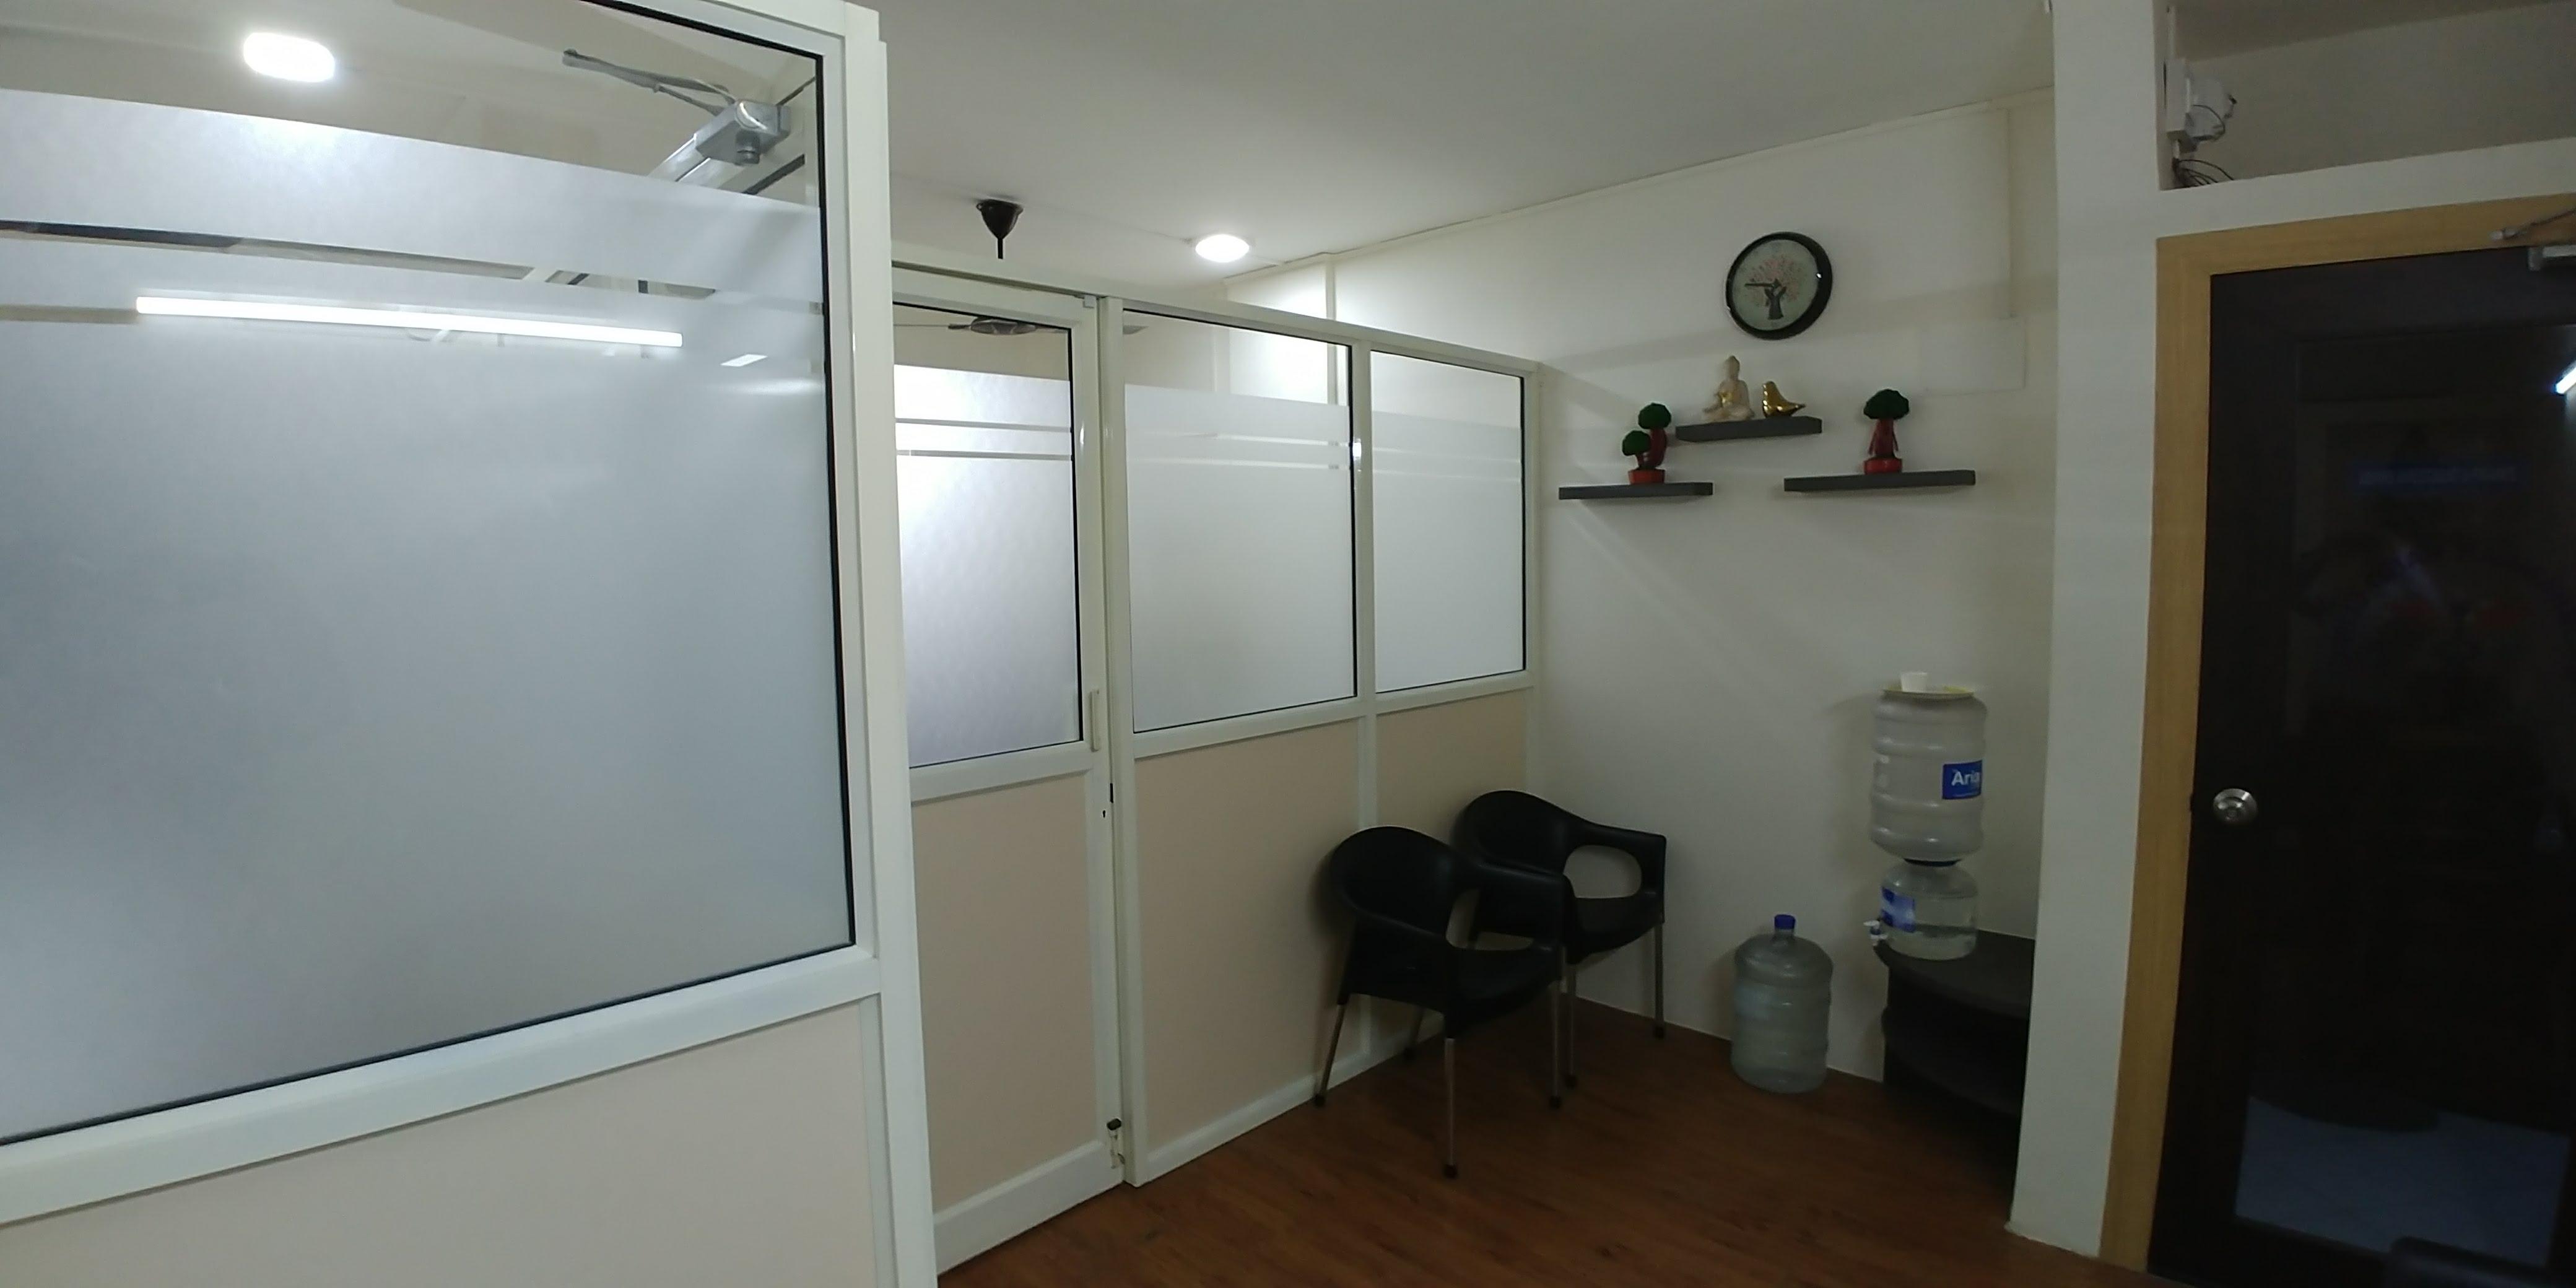 Shubhamkar hand clinic|Kothrud,Pune